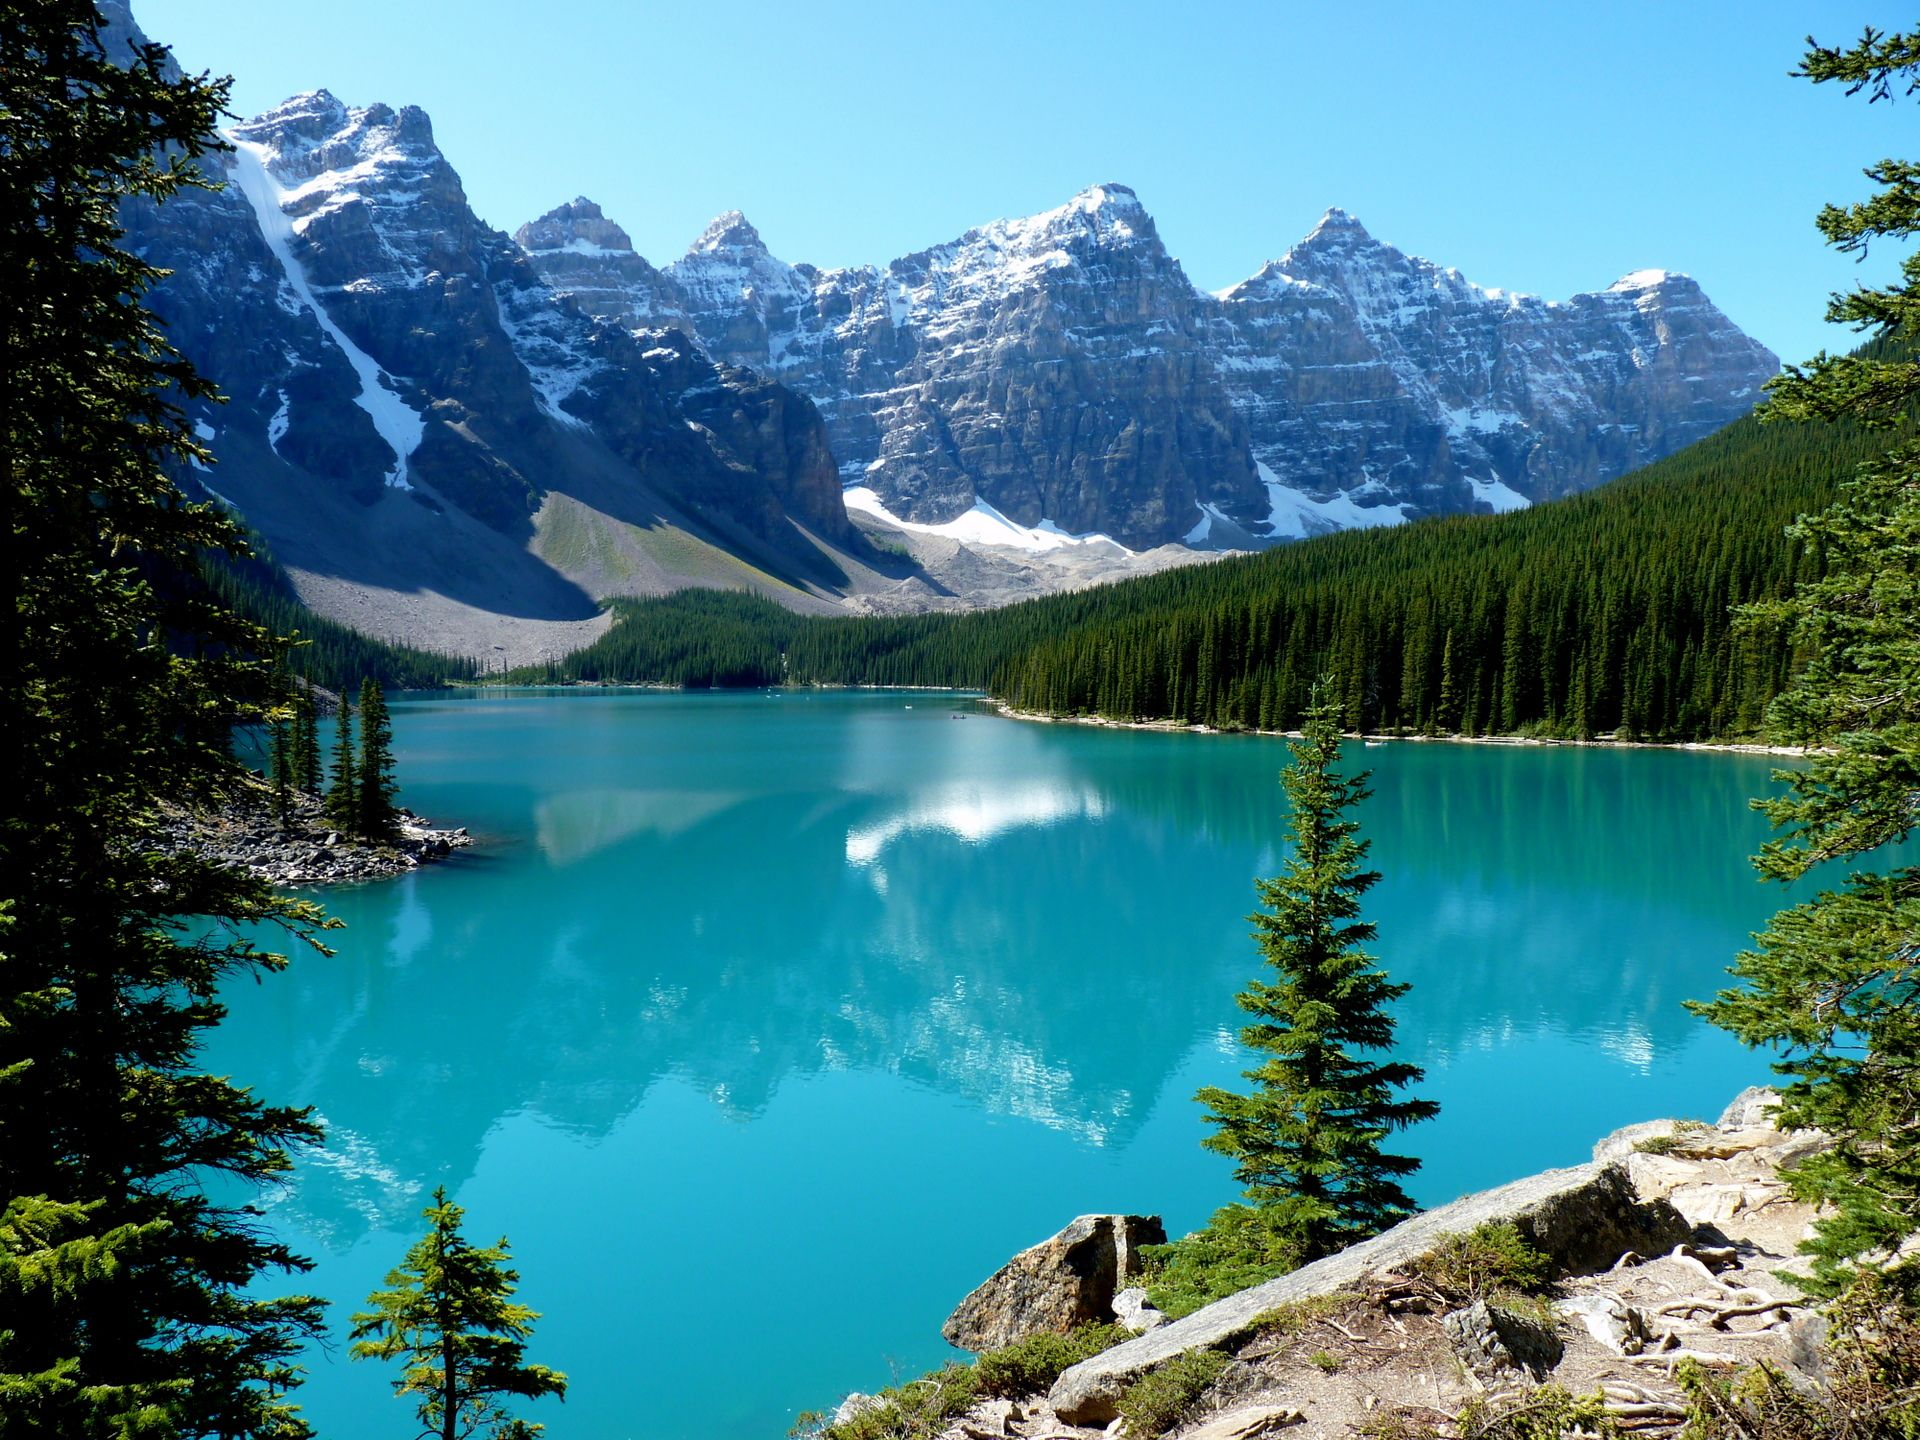 Moraine lake, canada, banff national park, озеро морейн